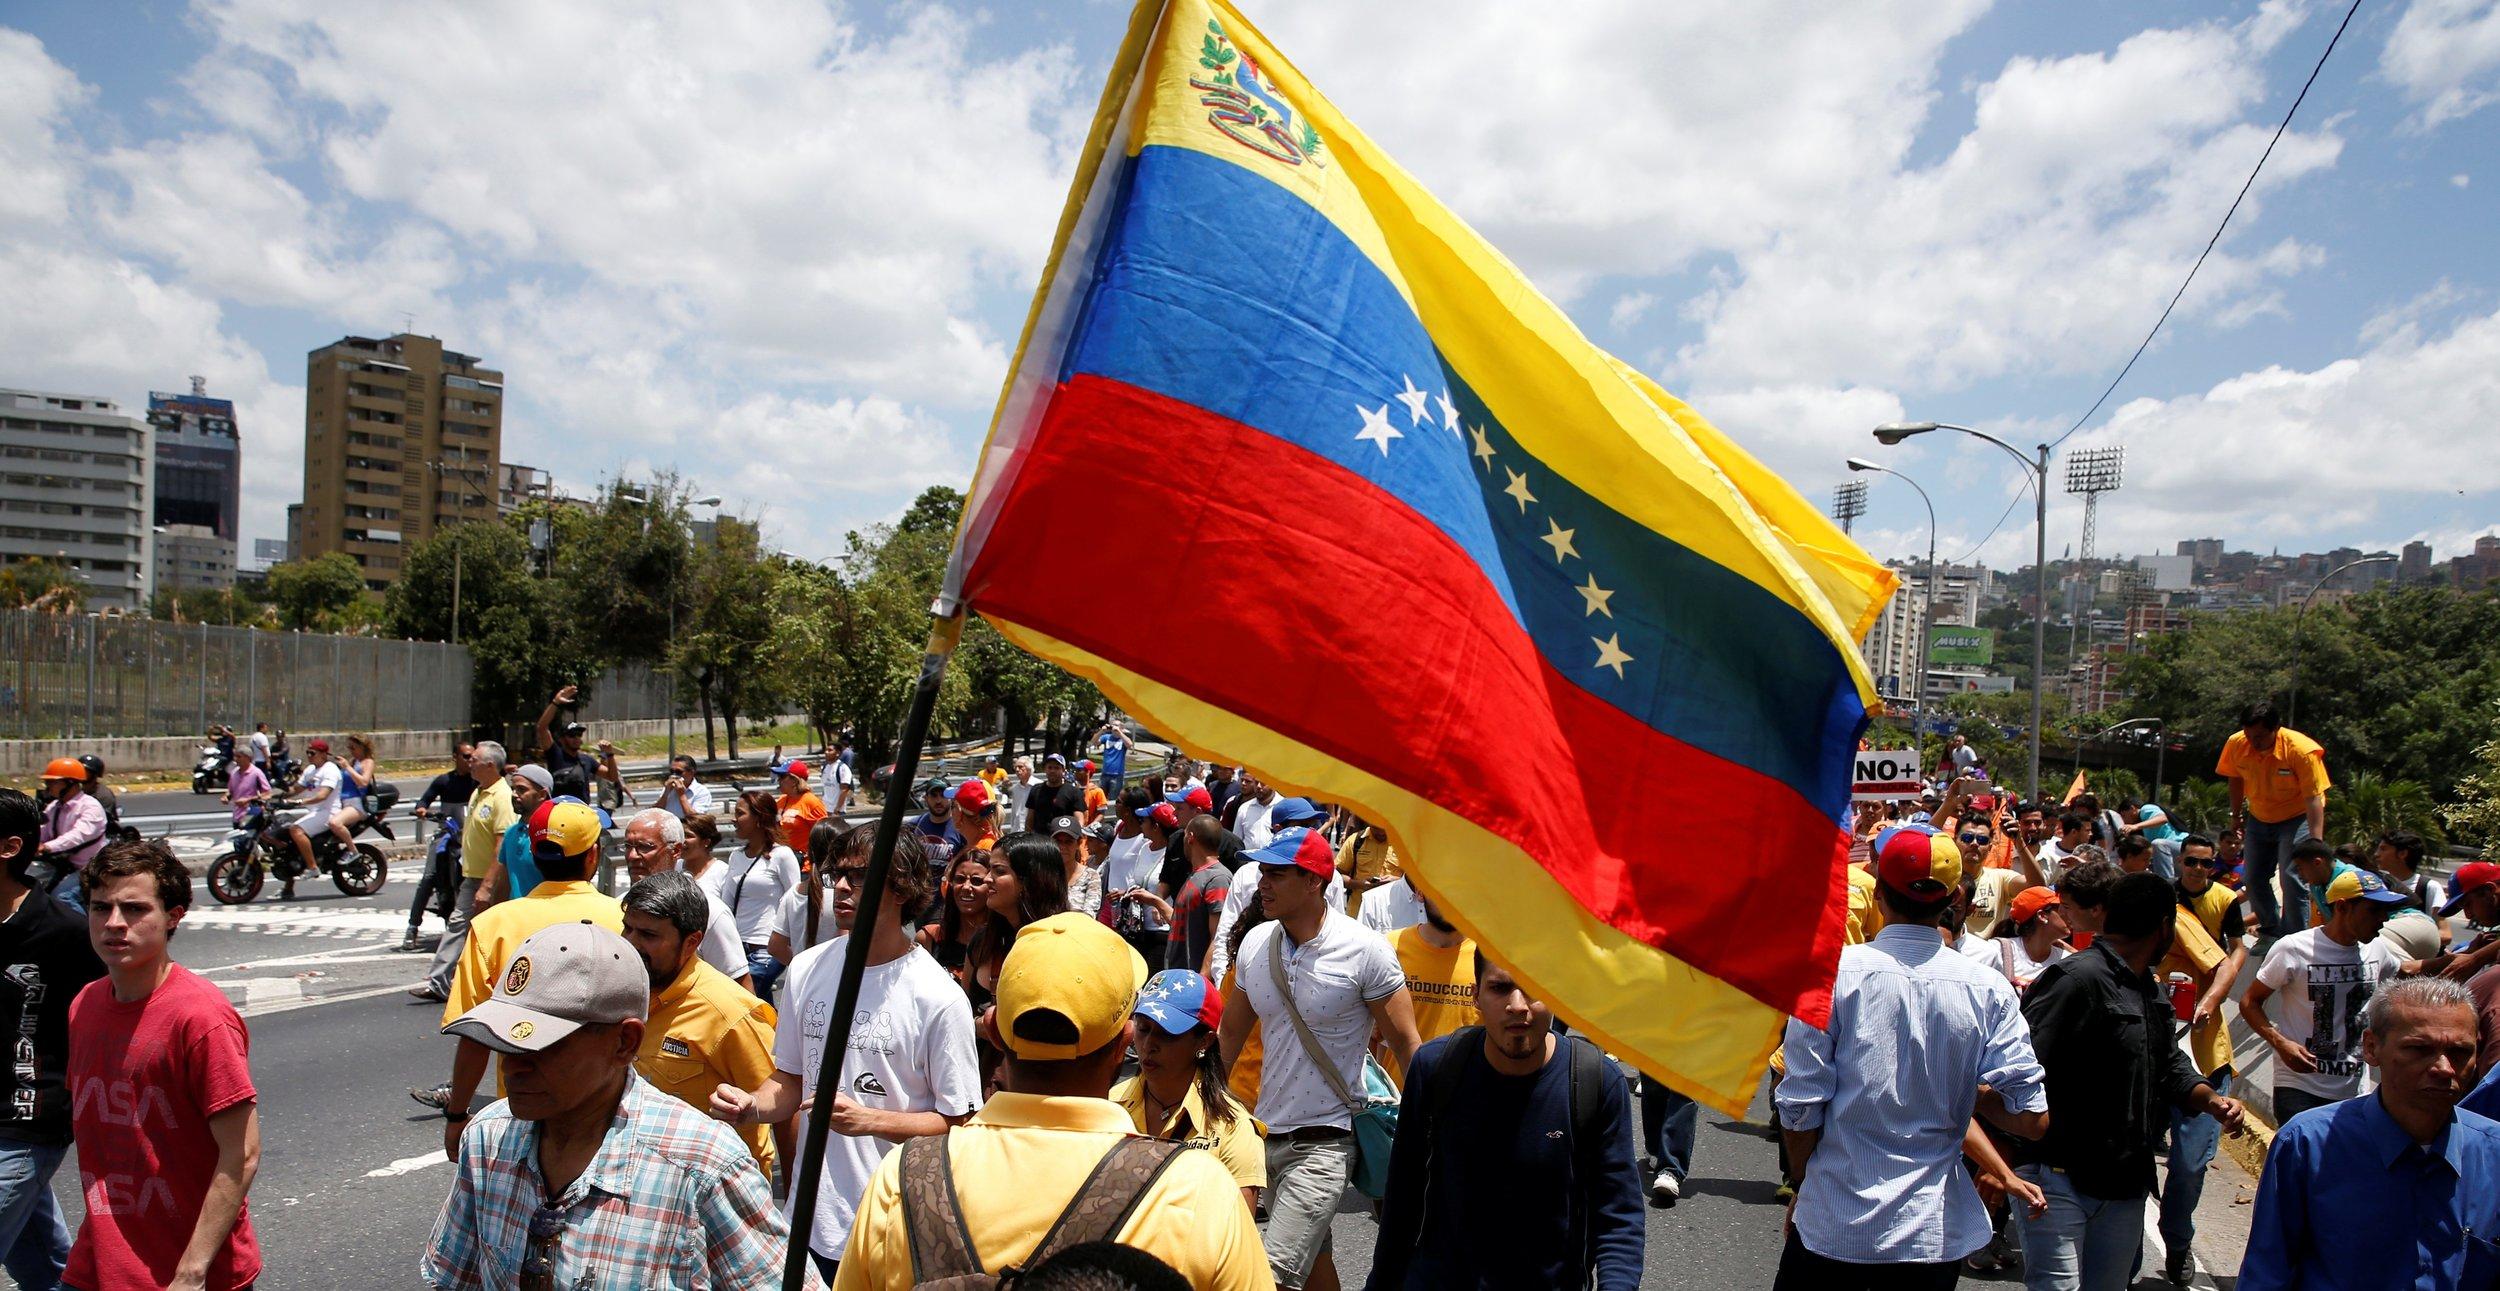 venezuela_protest_flag001-e1491425661760.jpg